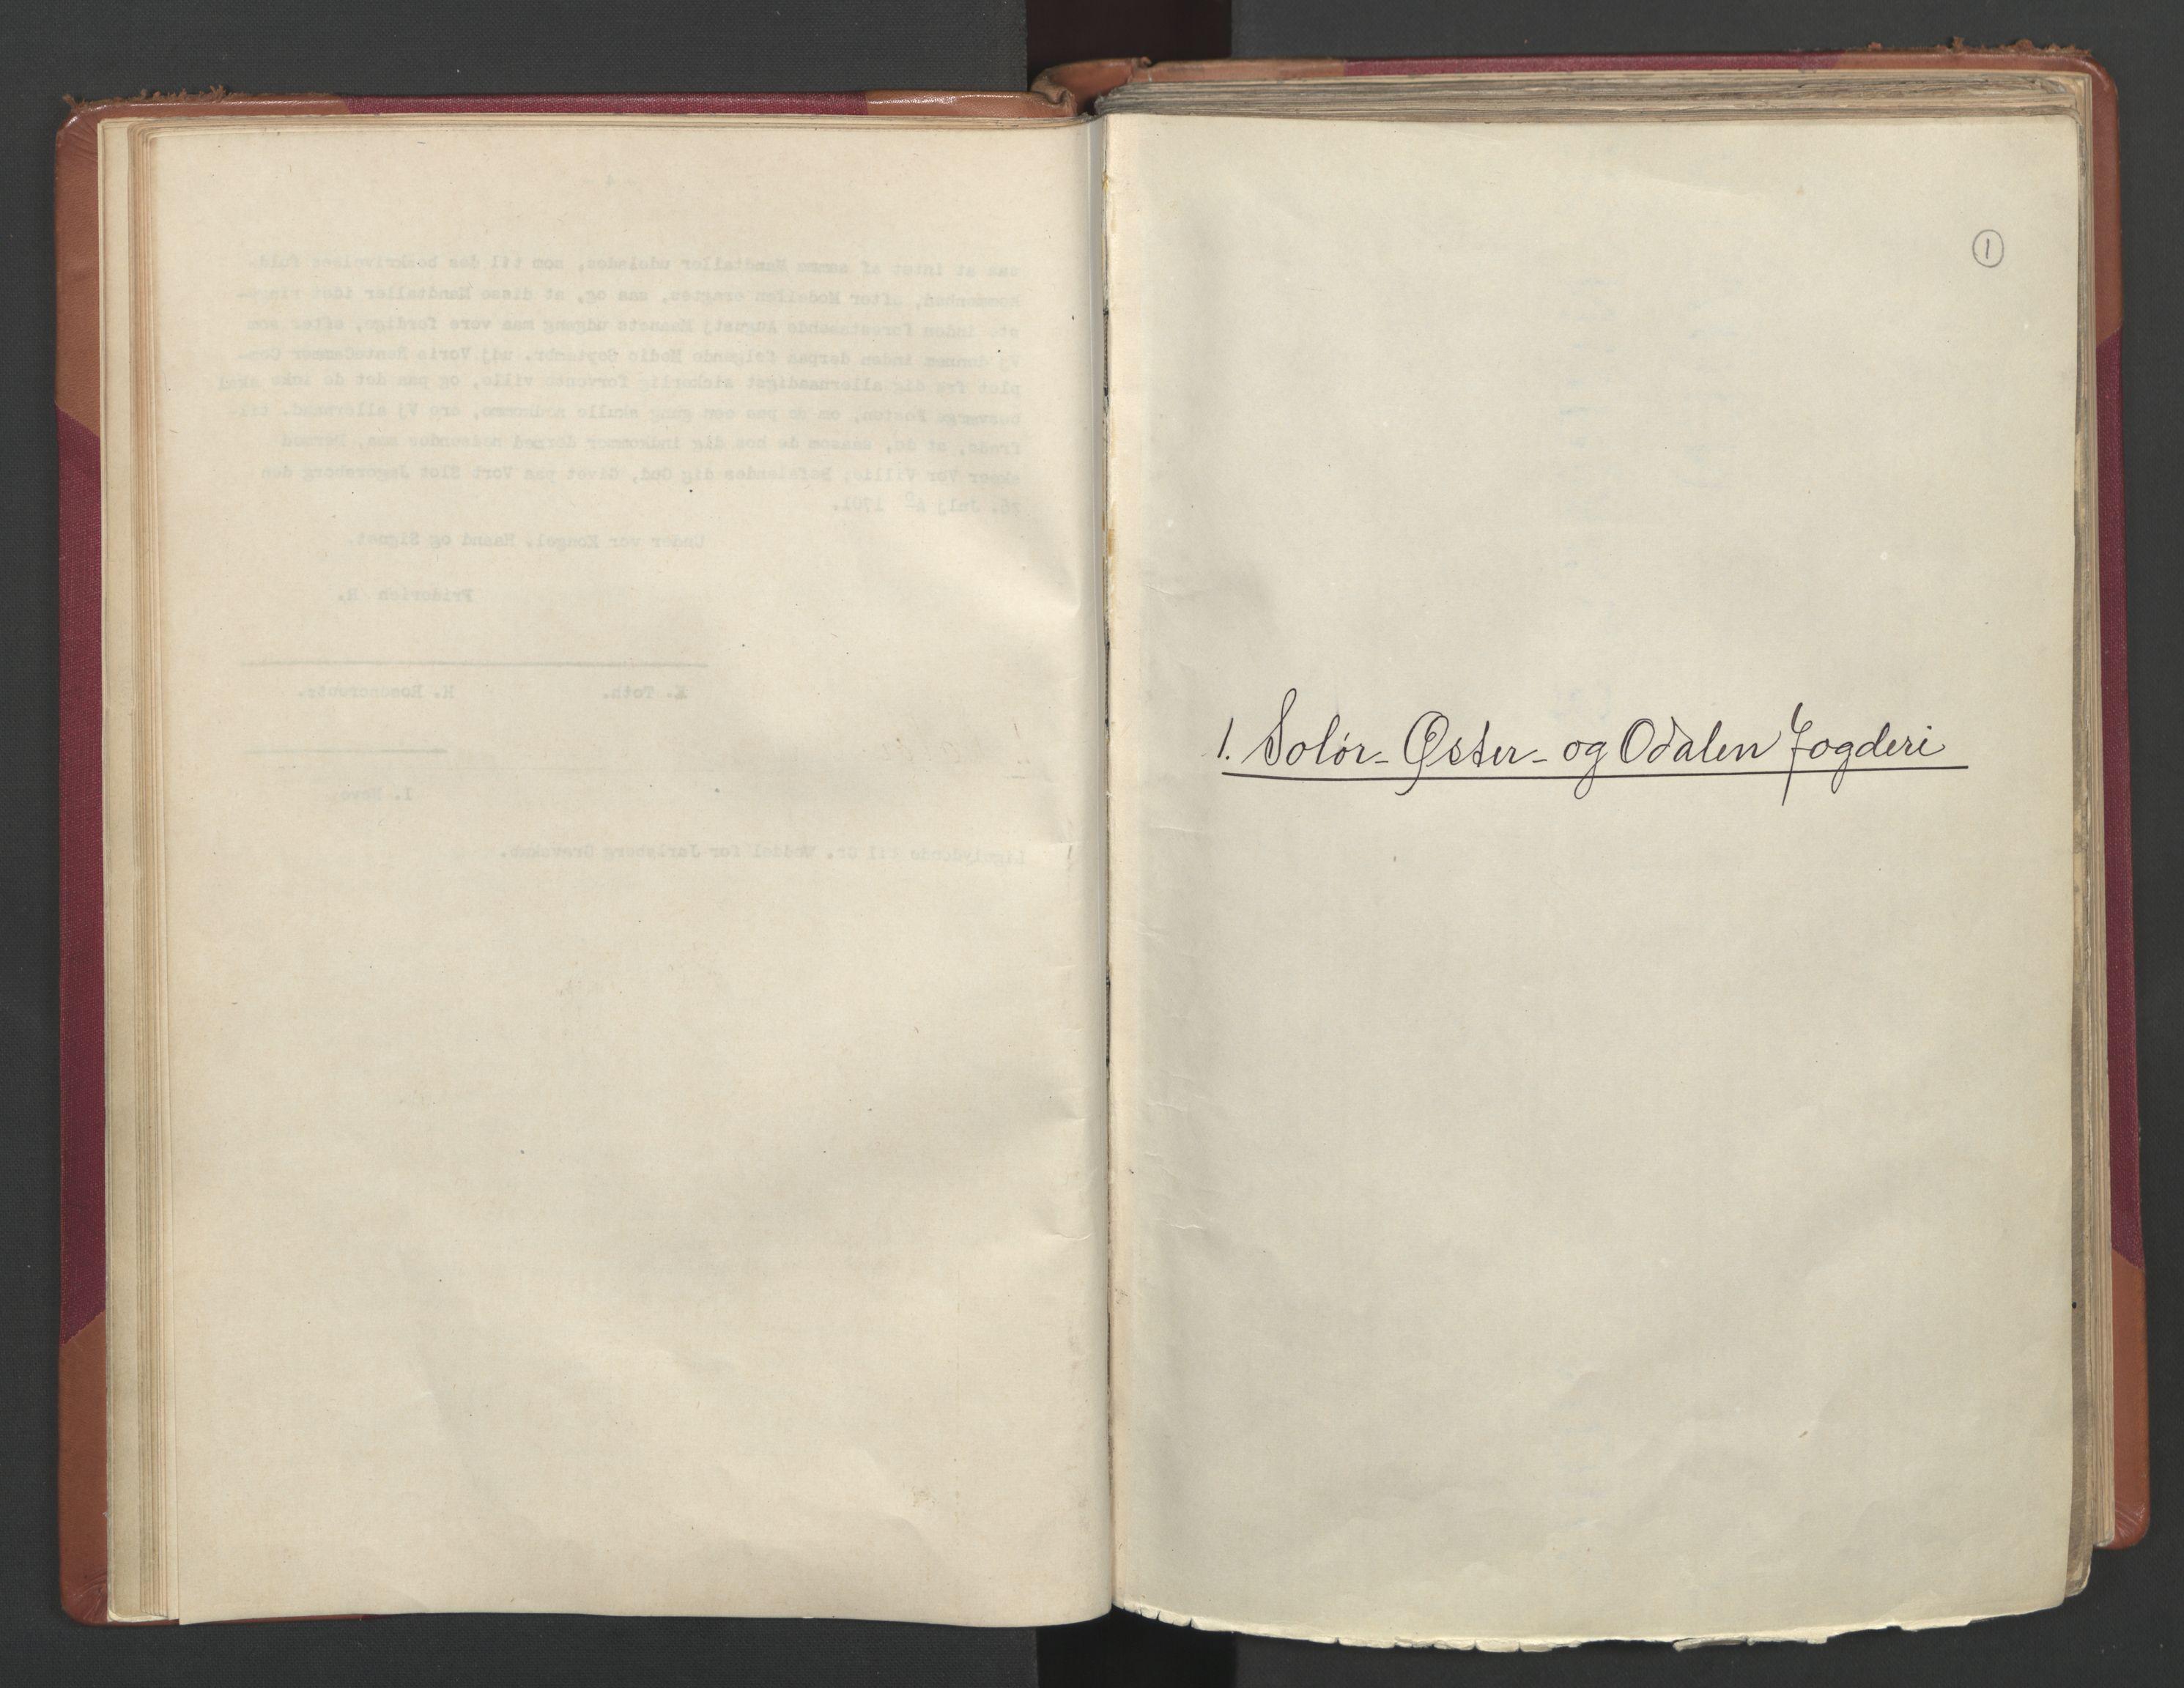 RA, Manntallet 1701, nr. 2: Solør, Odal og Østerdal fogderi og Larvik grevskap, 1701, s. 1